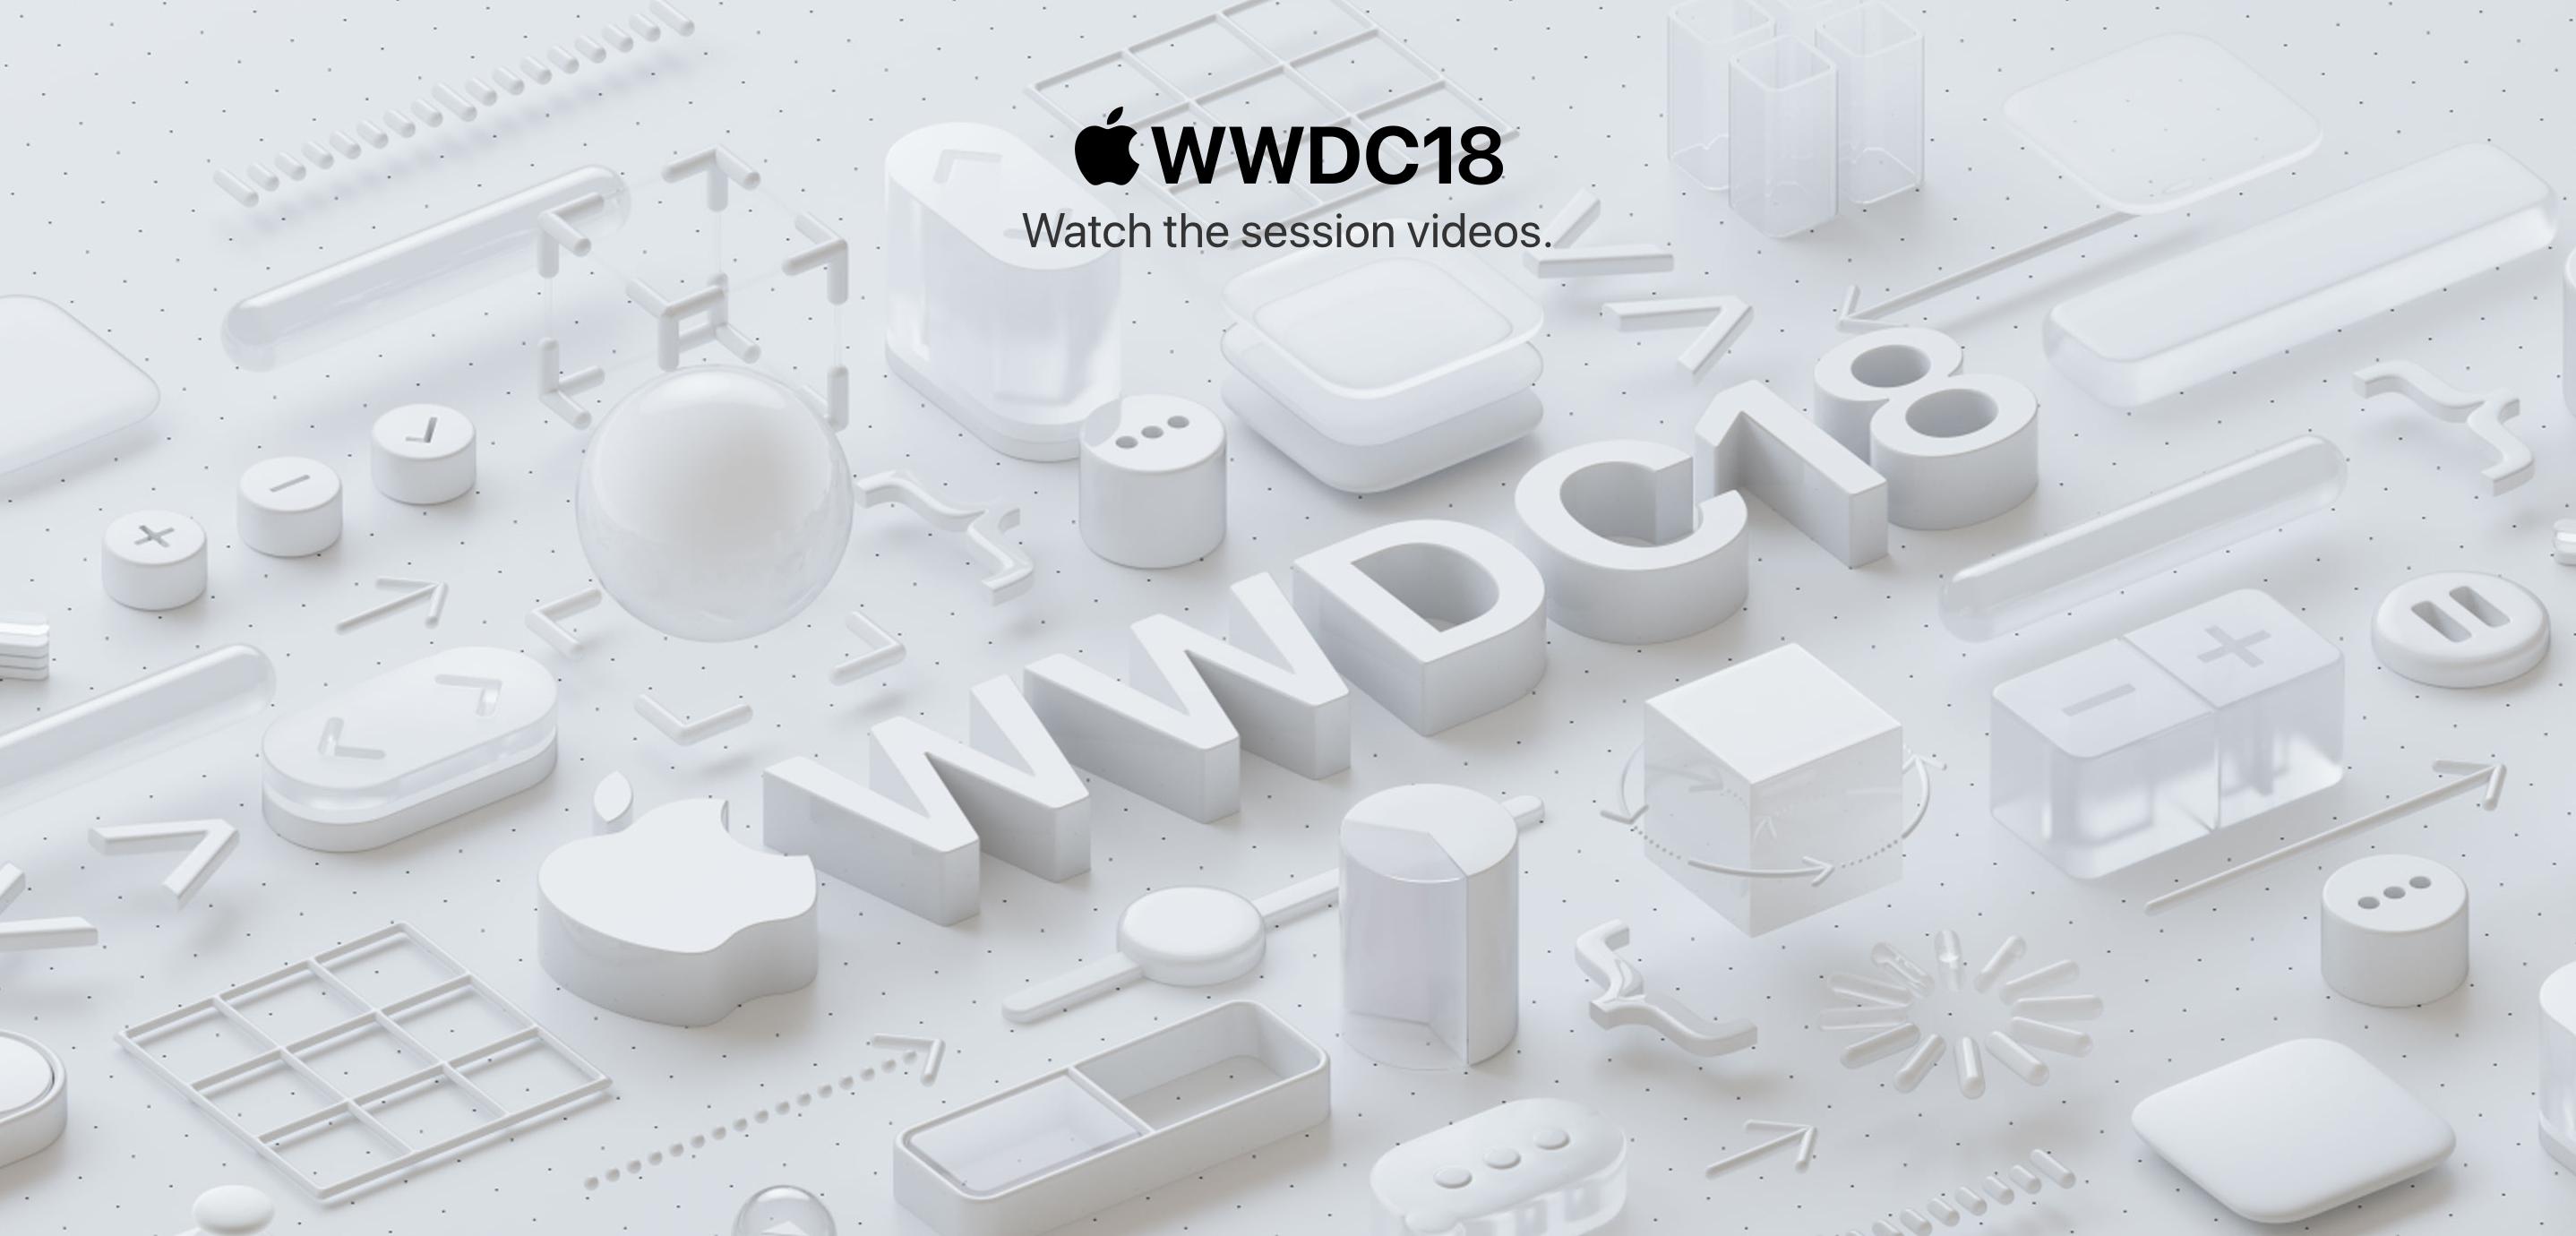 20180622- iOS AppStore 套壳开发上架过程-彩票类App-有点感慨